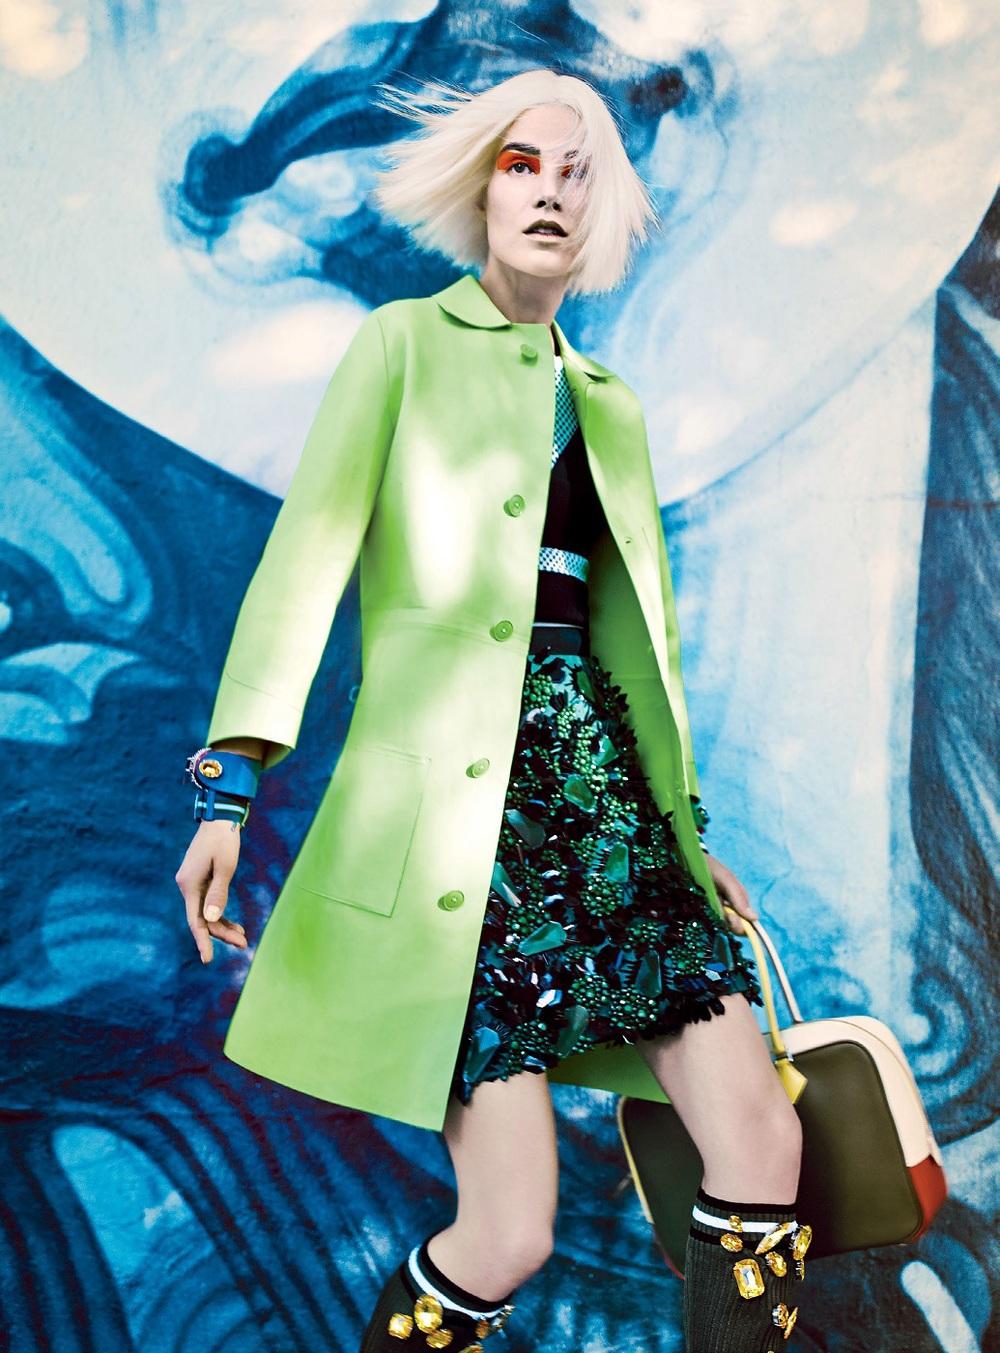 Craig McDean / Suvi Koponen & Joan Smalls / Vogue US